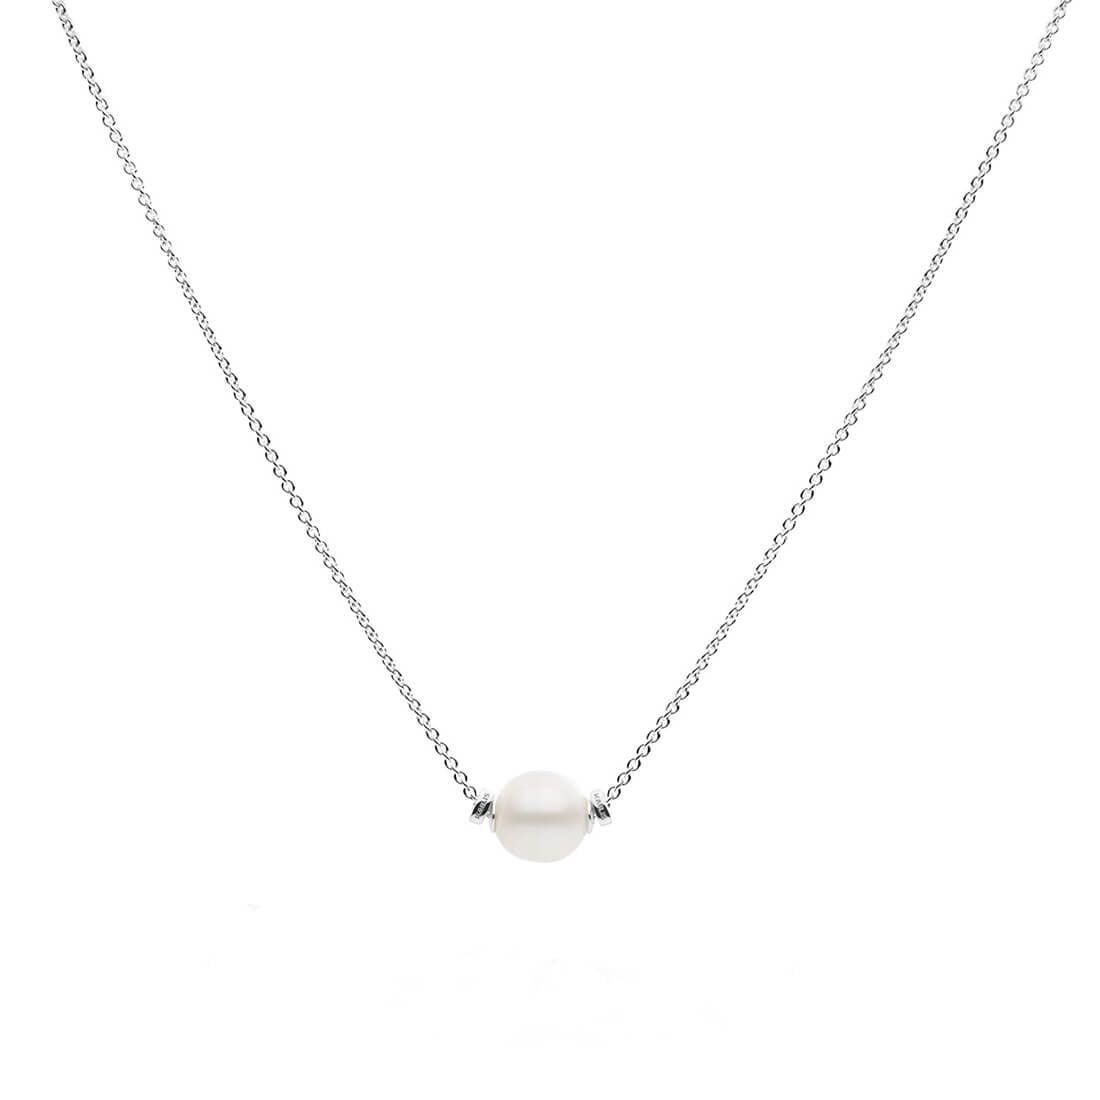 Kailis - Sliding Pearl Necklace